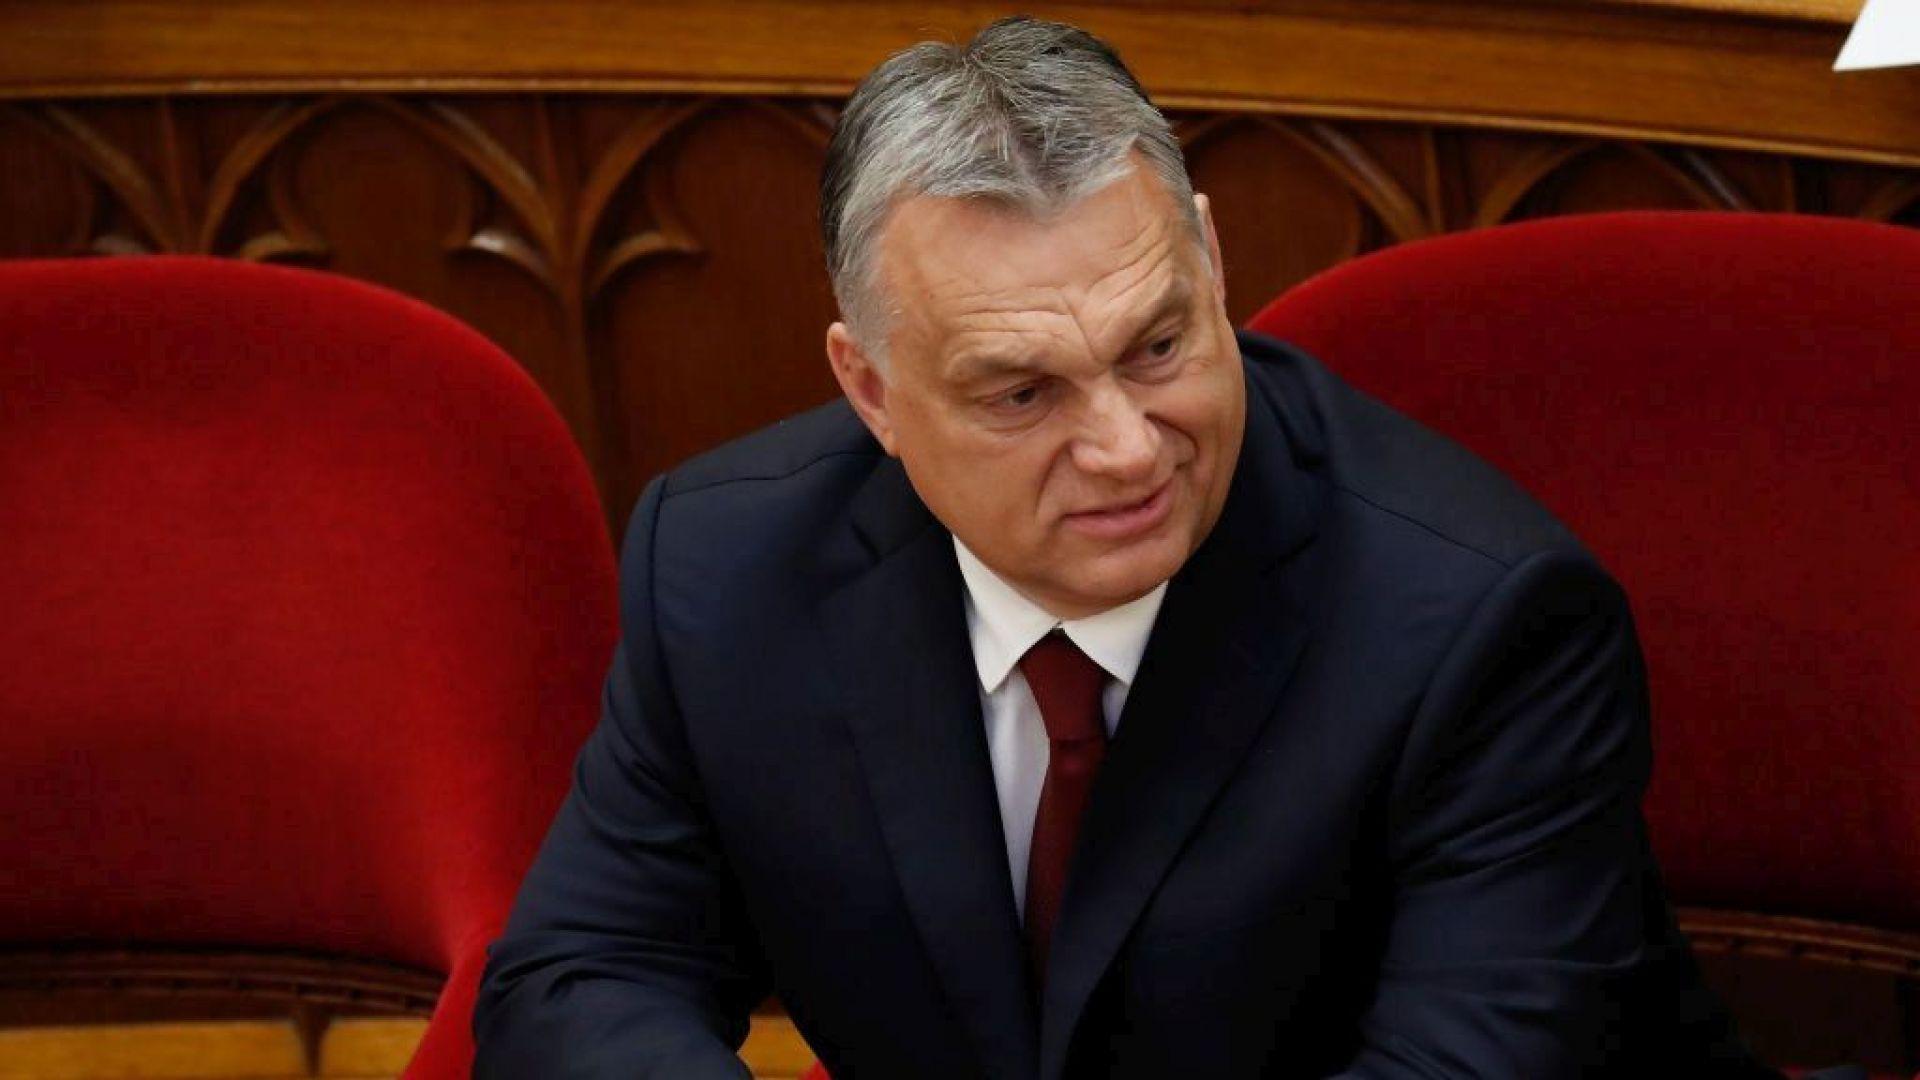 Скандал между Орбан и медиен шеф прекръсти вестник в Унгария